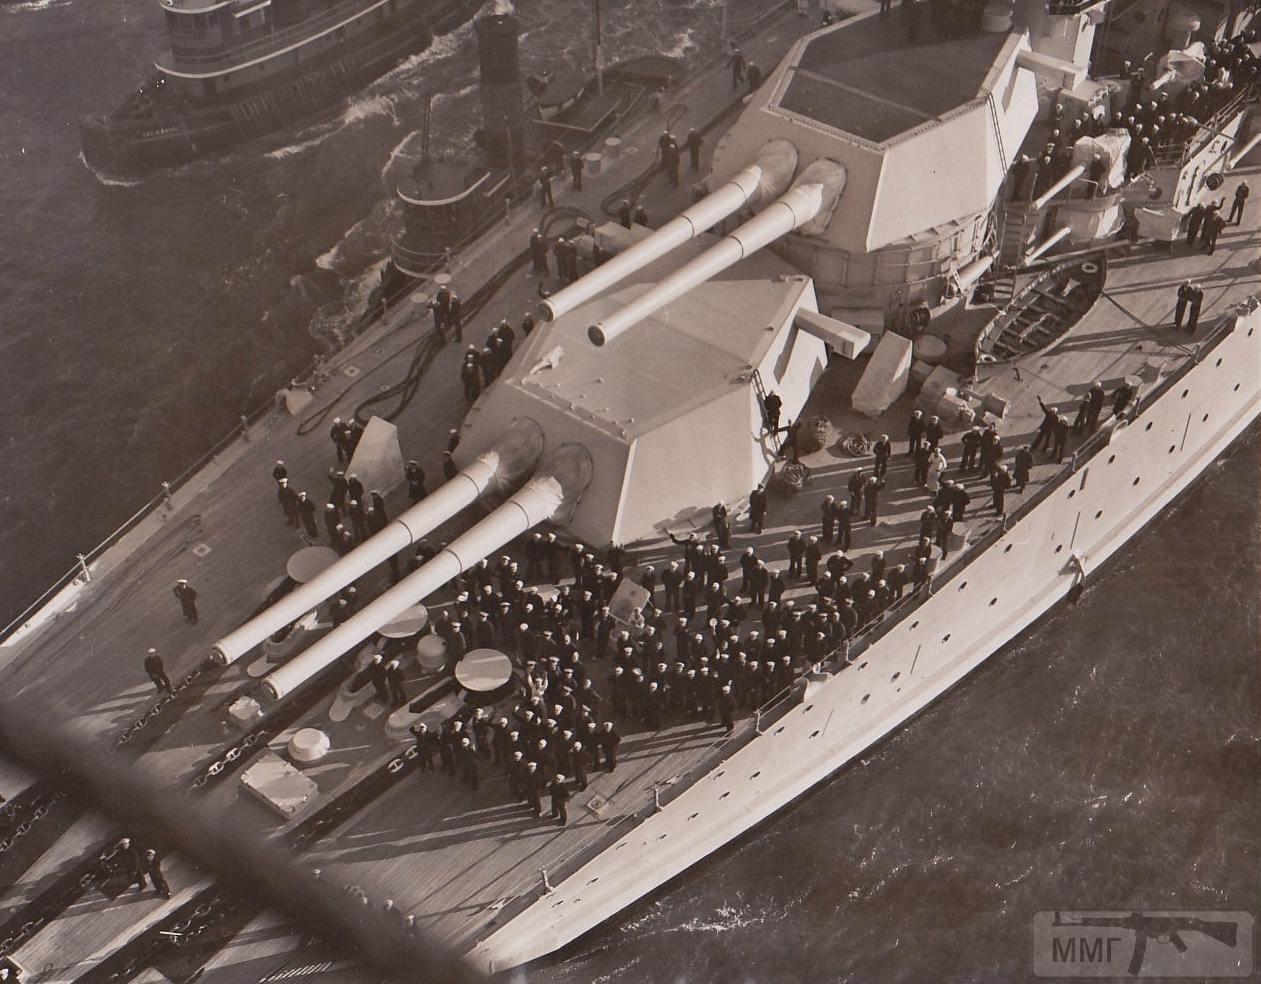 95571 - USS West Virginia (BB-48)